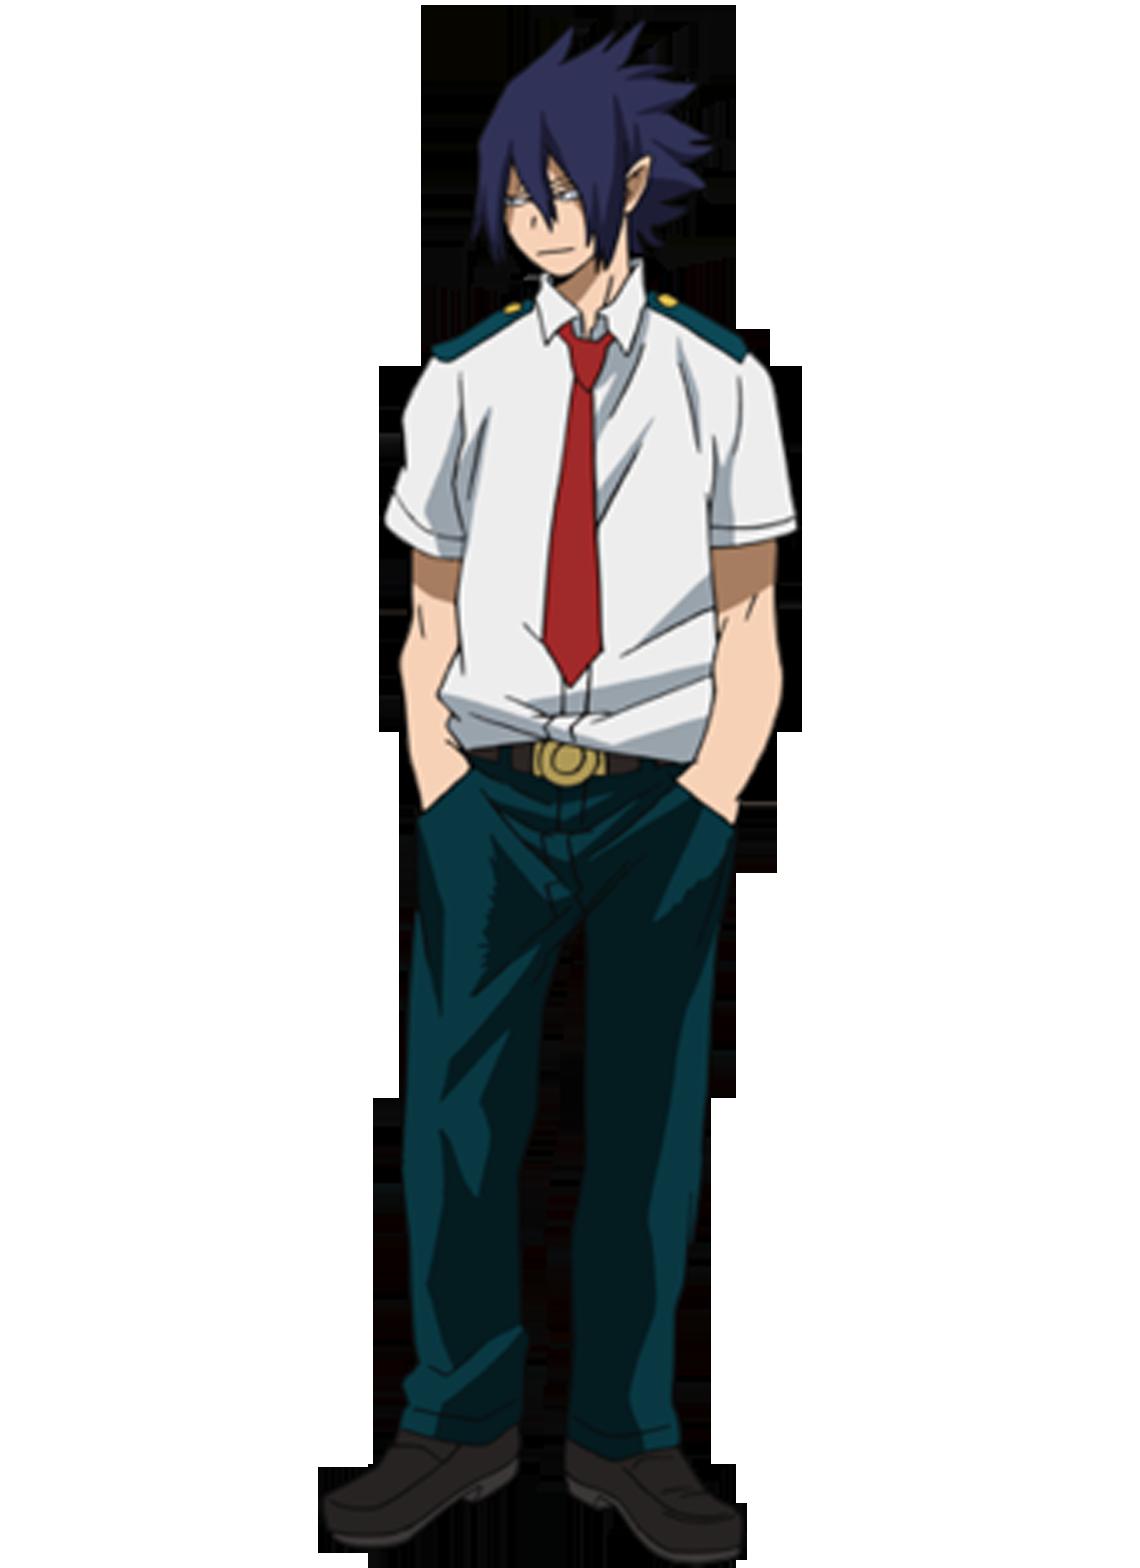 Tamaki Amajiki Tamaki, Heroe, Cómics